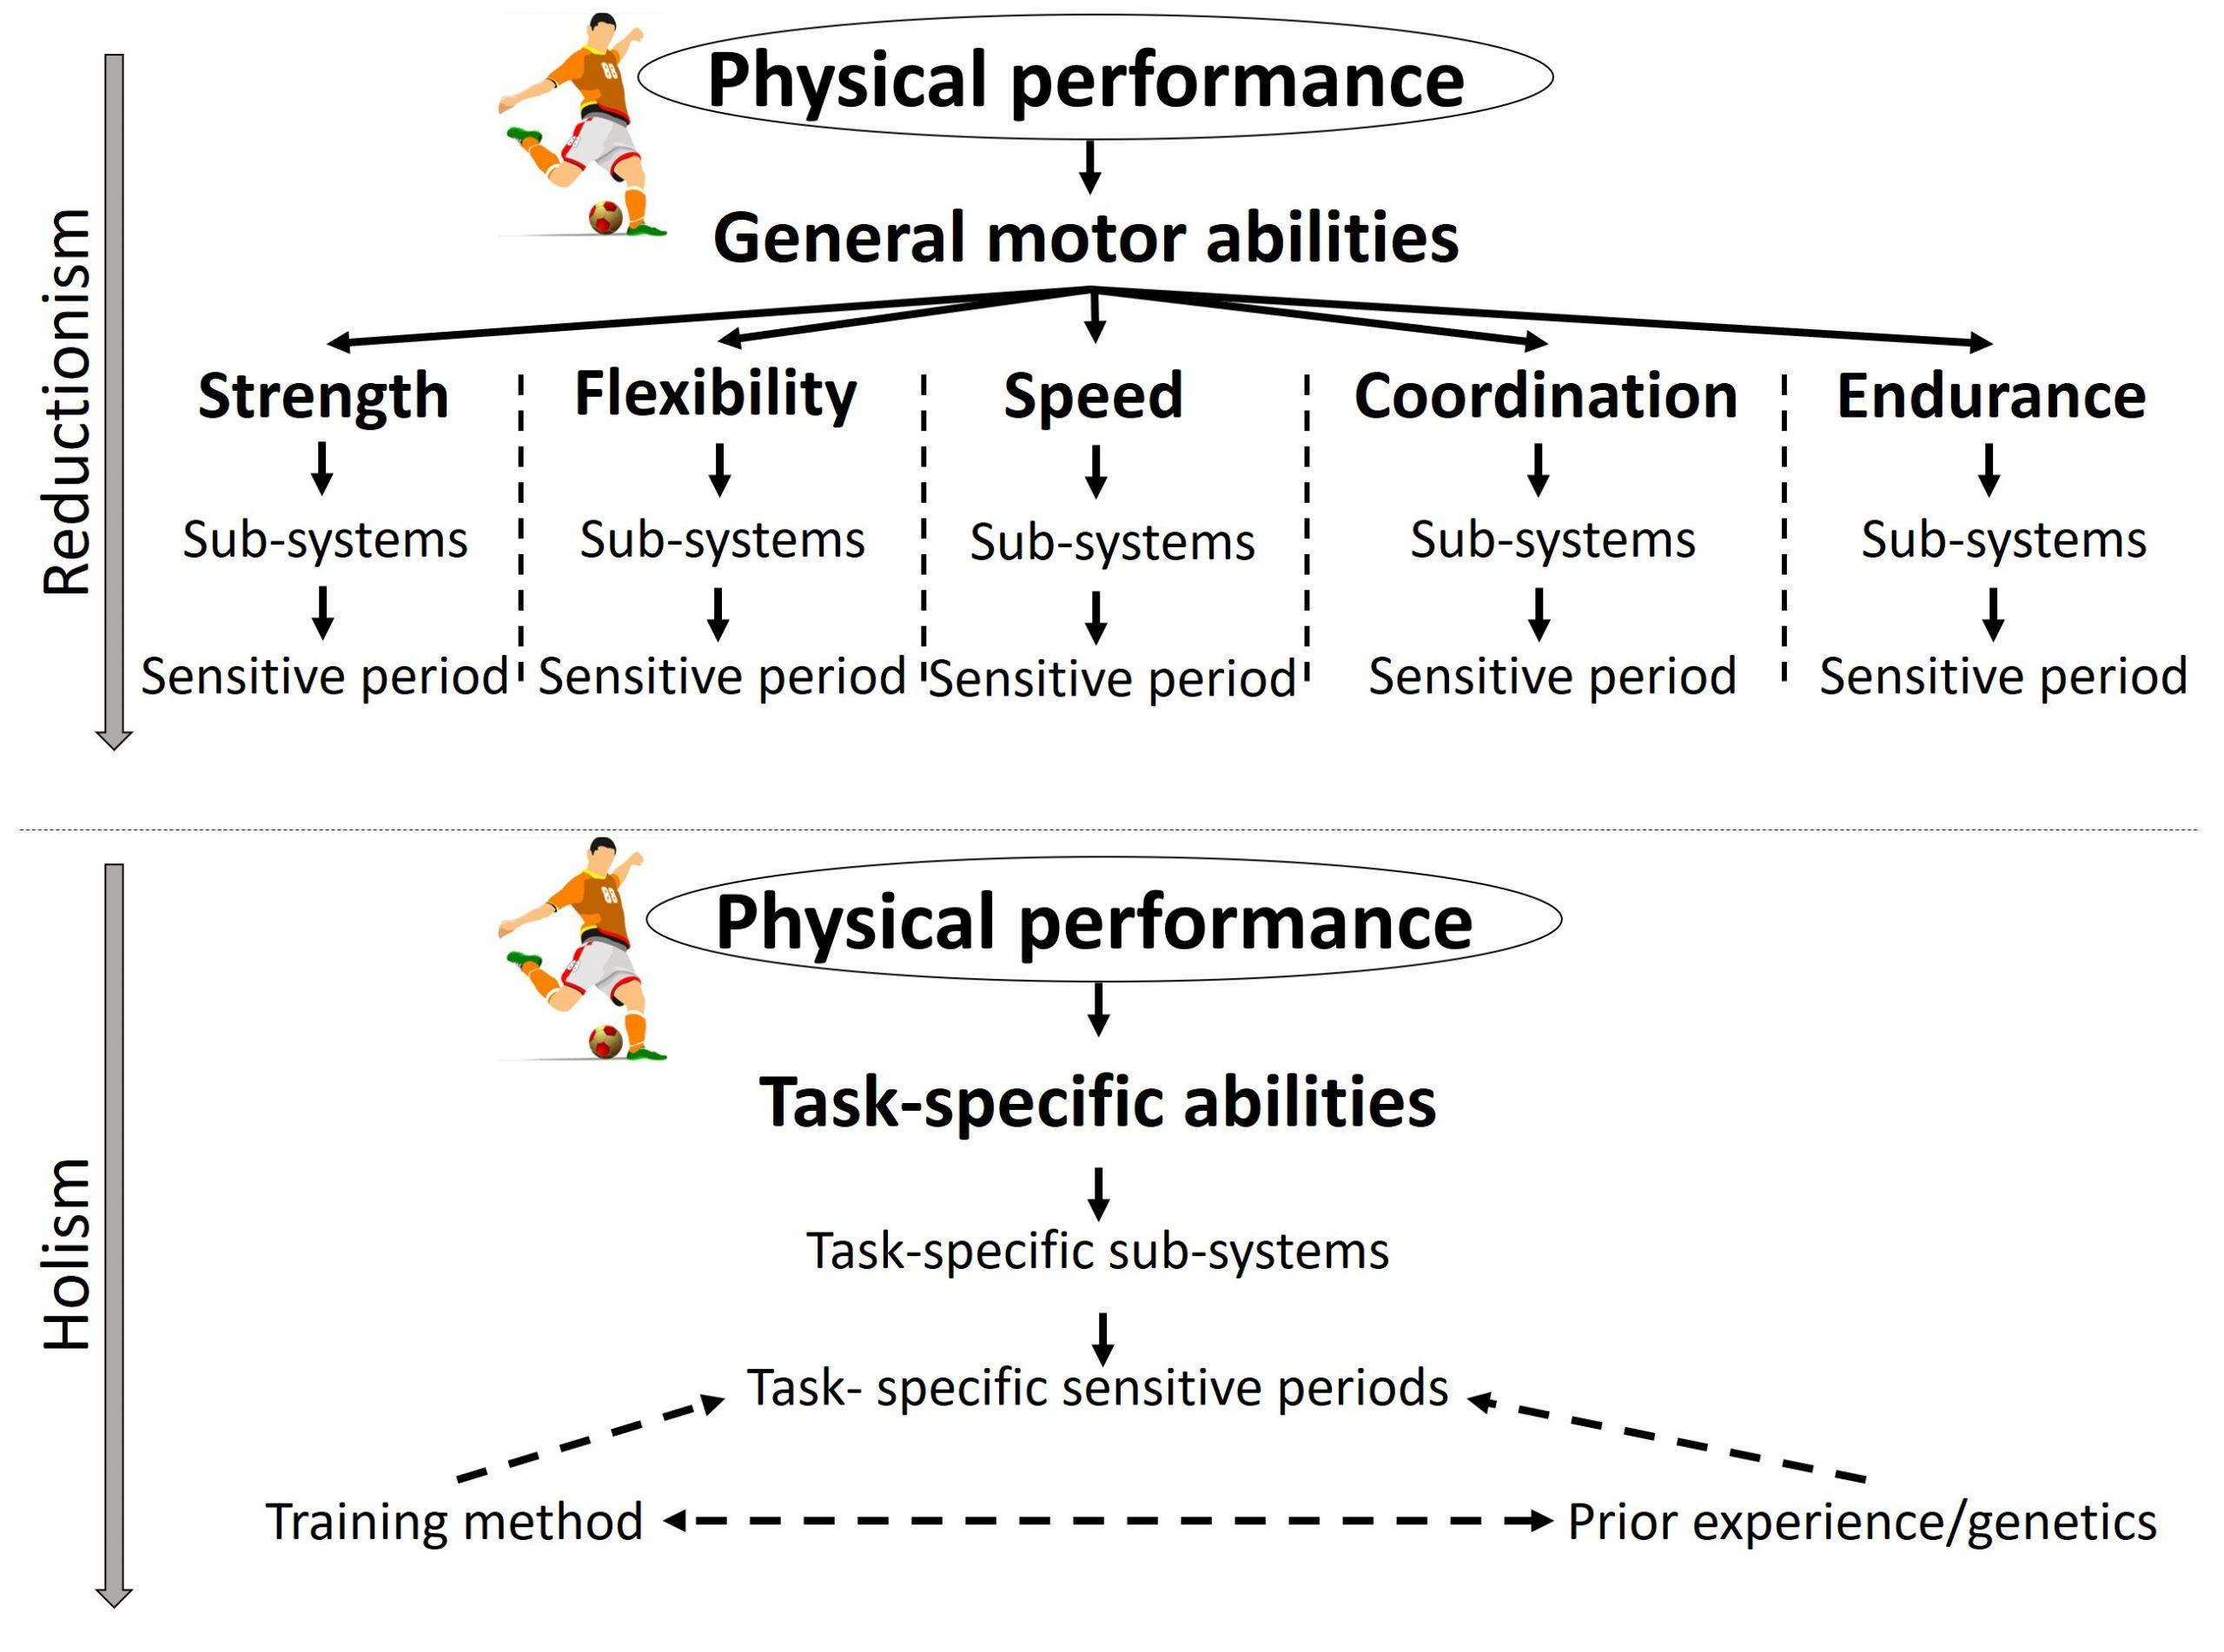 Sensitieve periodes training hollistische aanpak